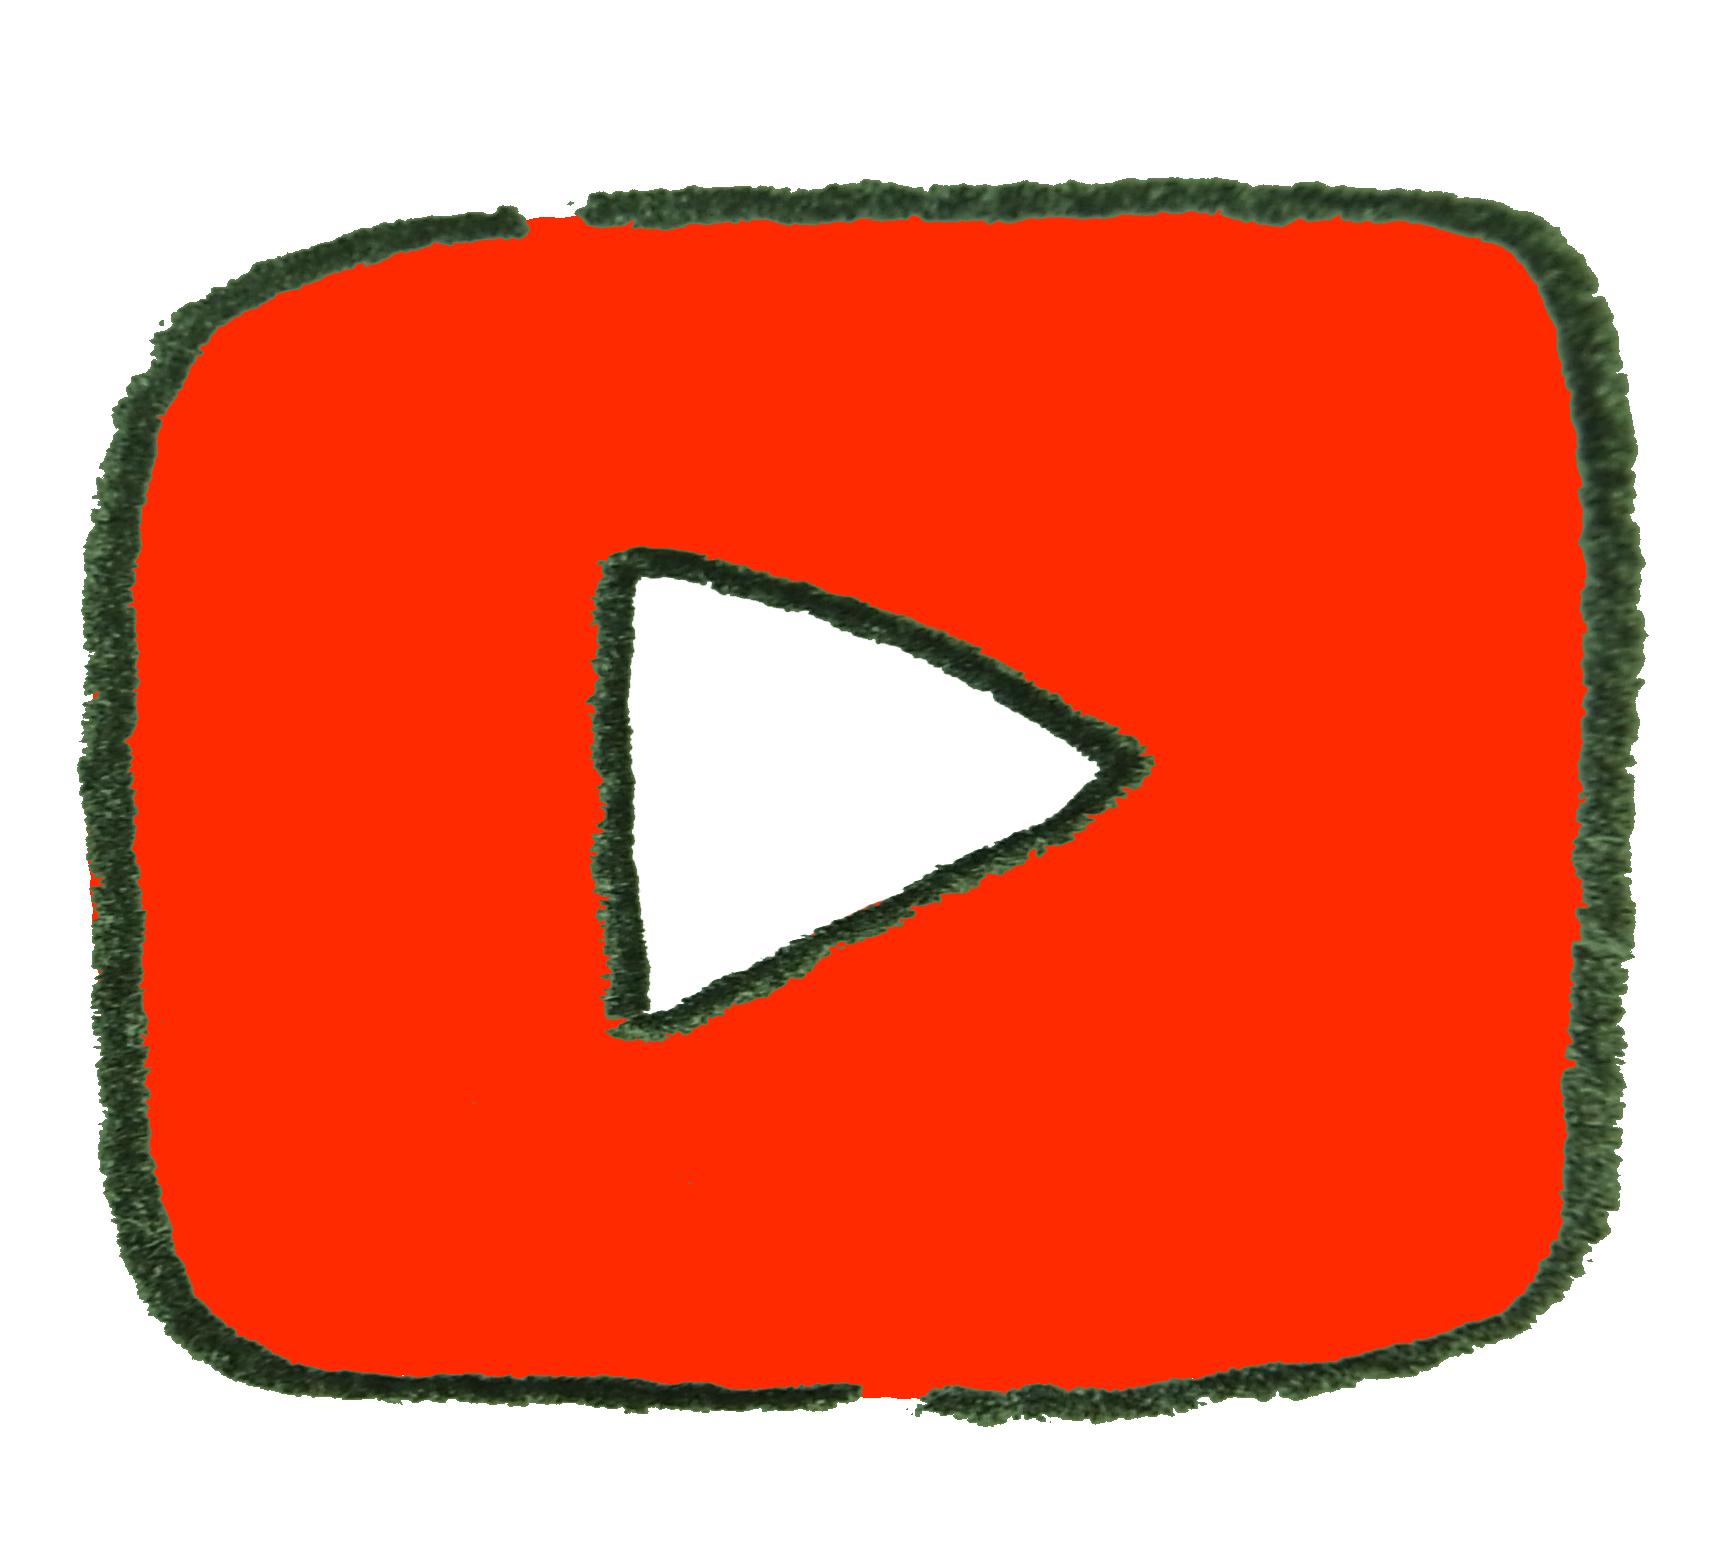 「You Tube フリー素材」の画像検索結果